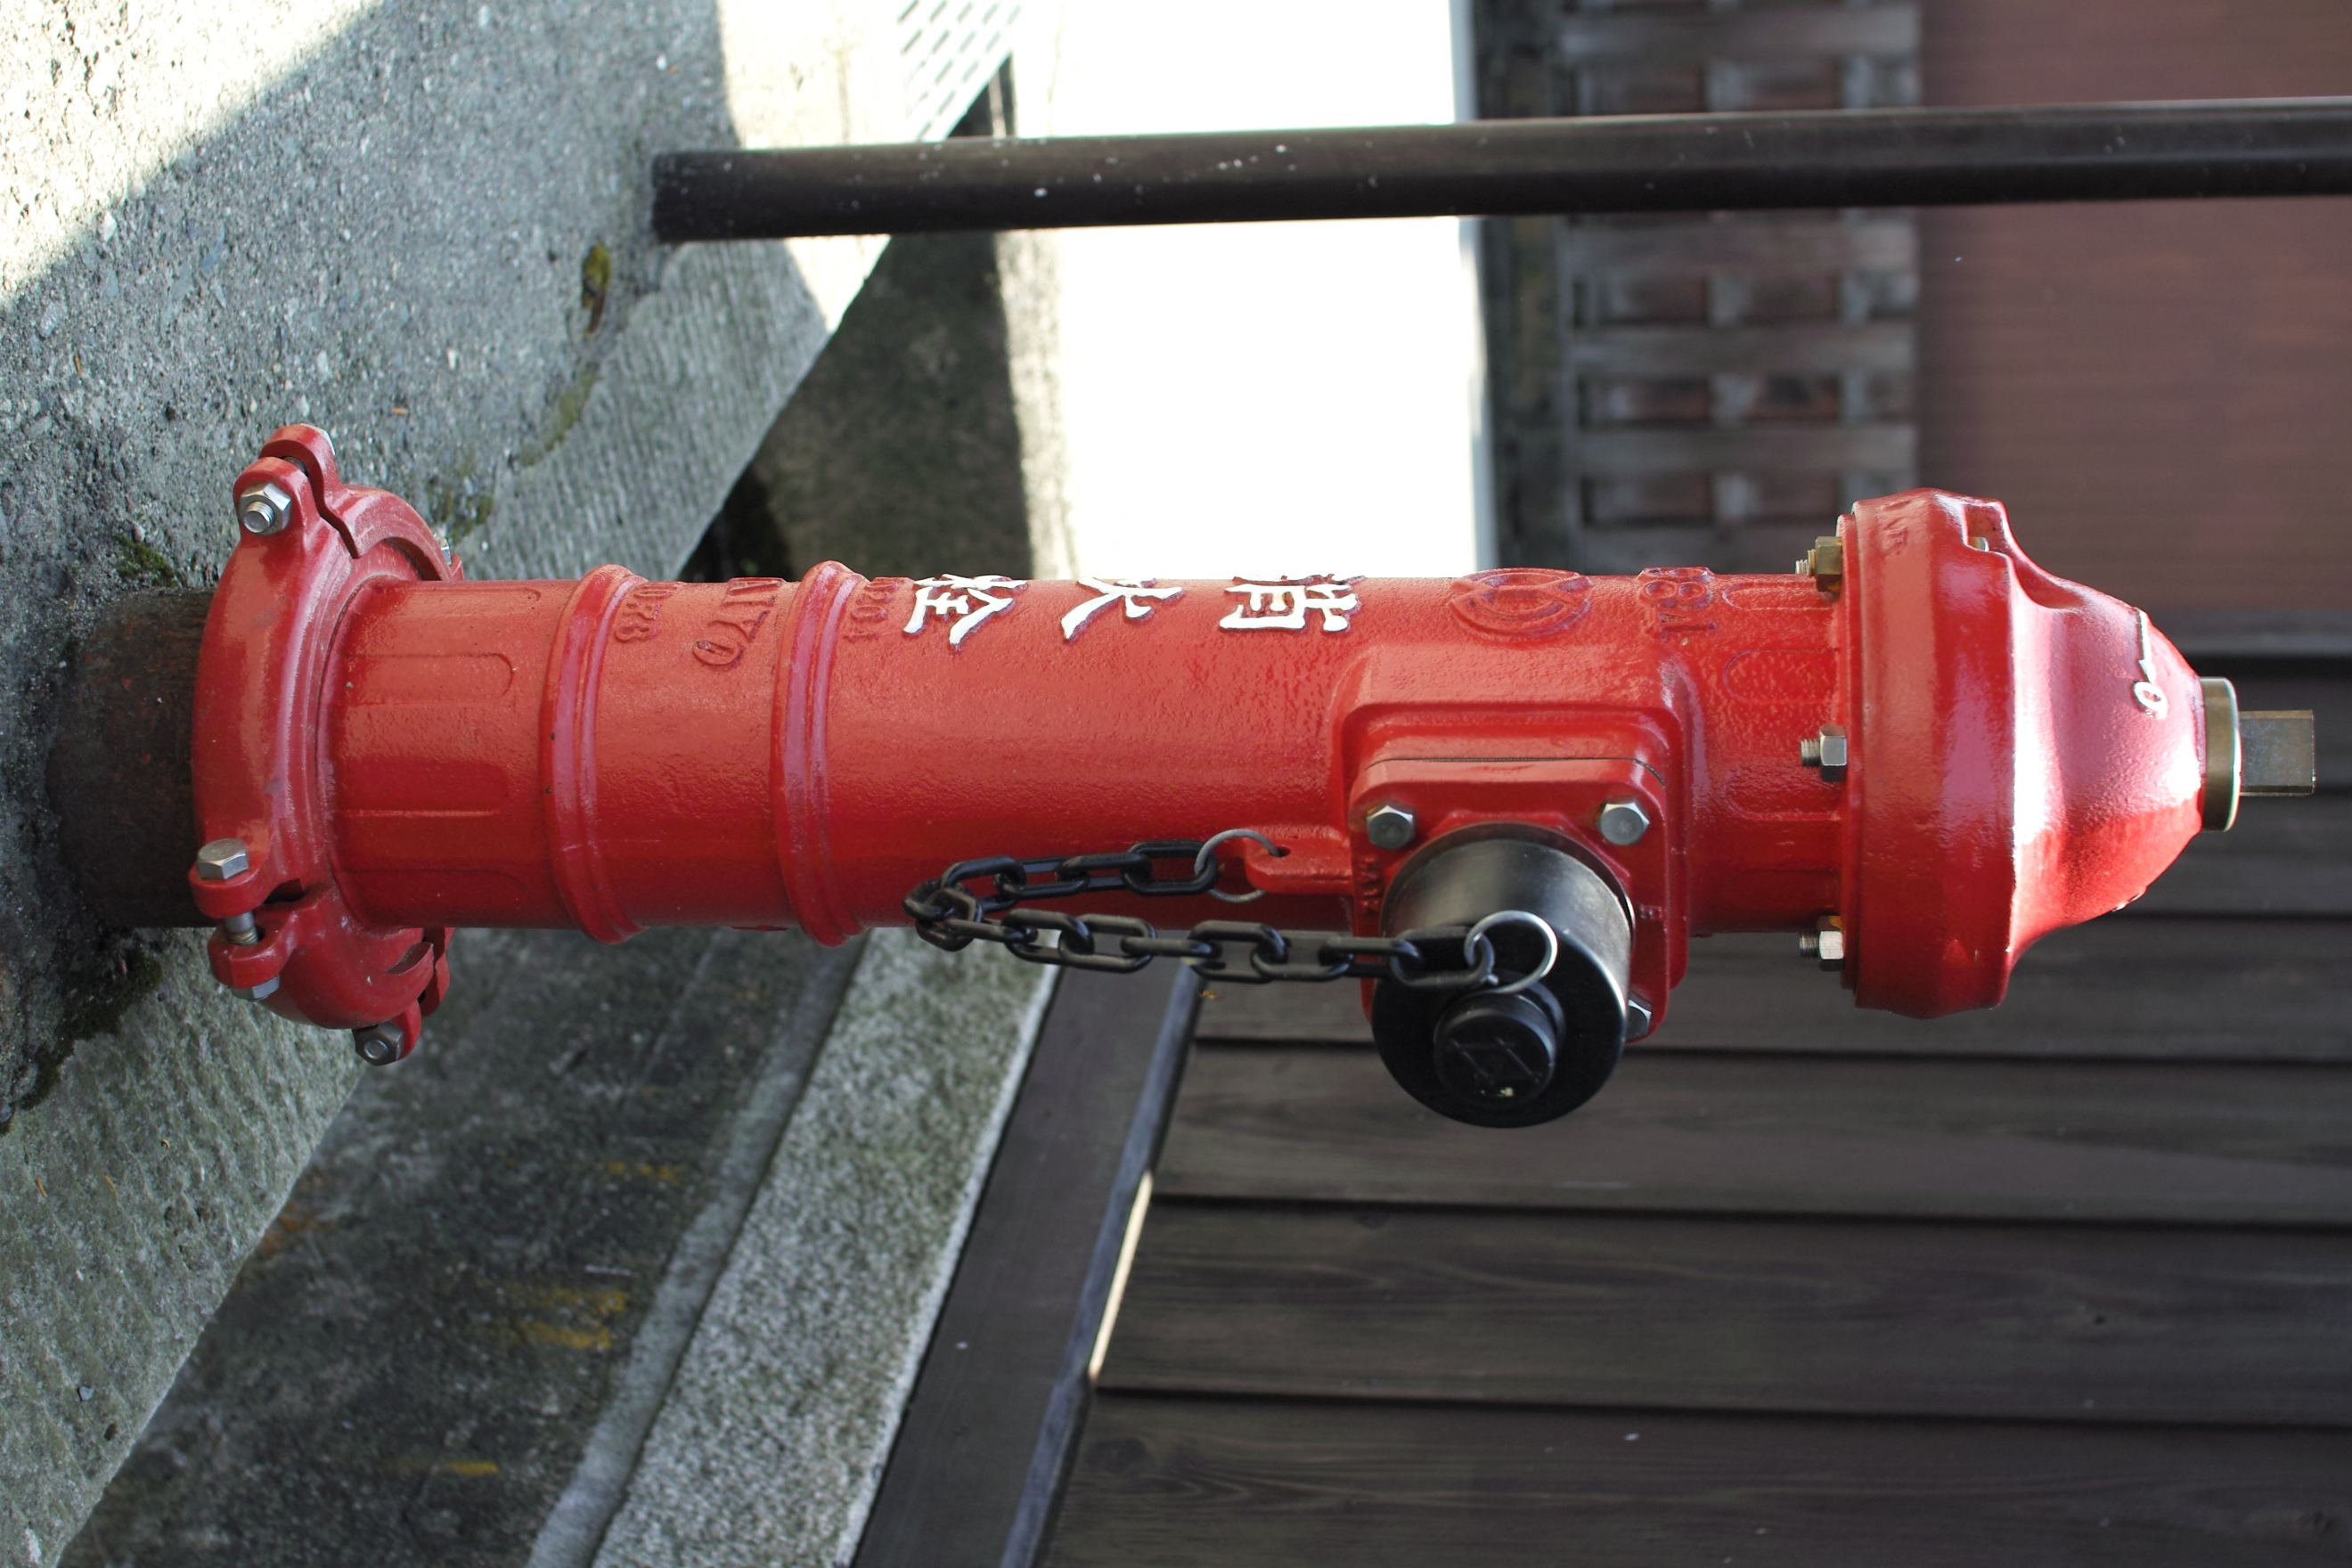 <b>SD15 / 30mm F1.4 DC HSM / 約2.4MB / 2,640×1,760 / 1/250秒 / F4 / -0.7EV / ISO100 / 30mm</b>